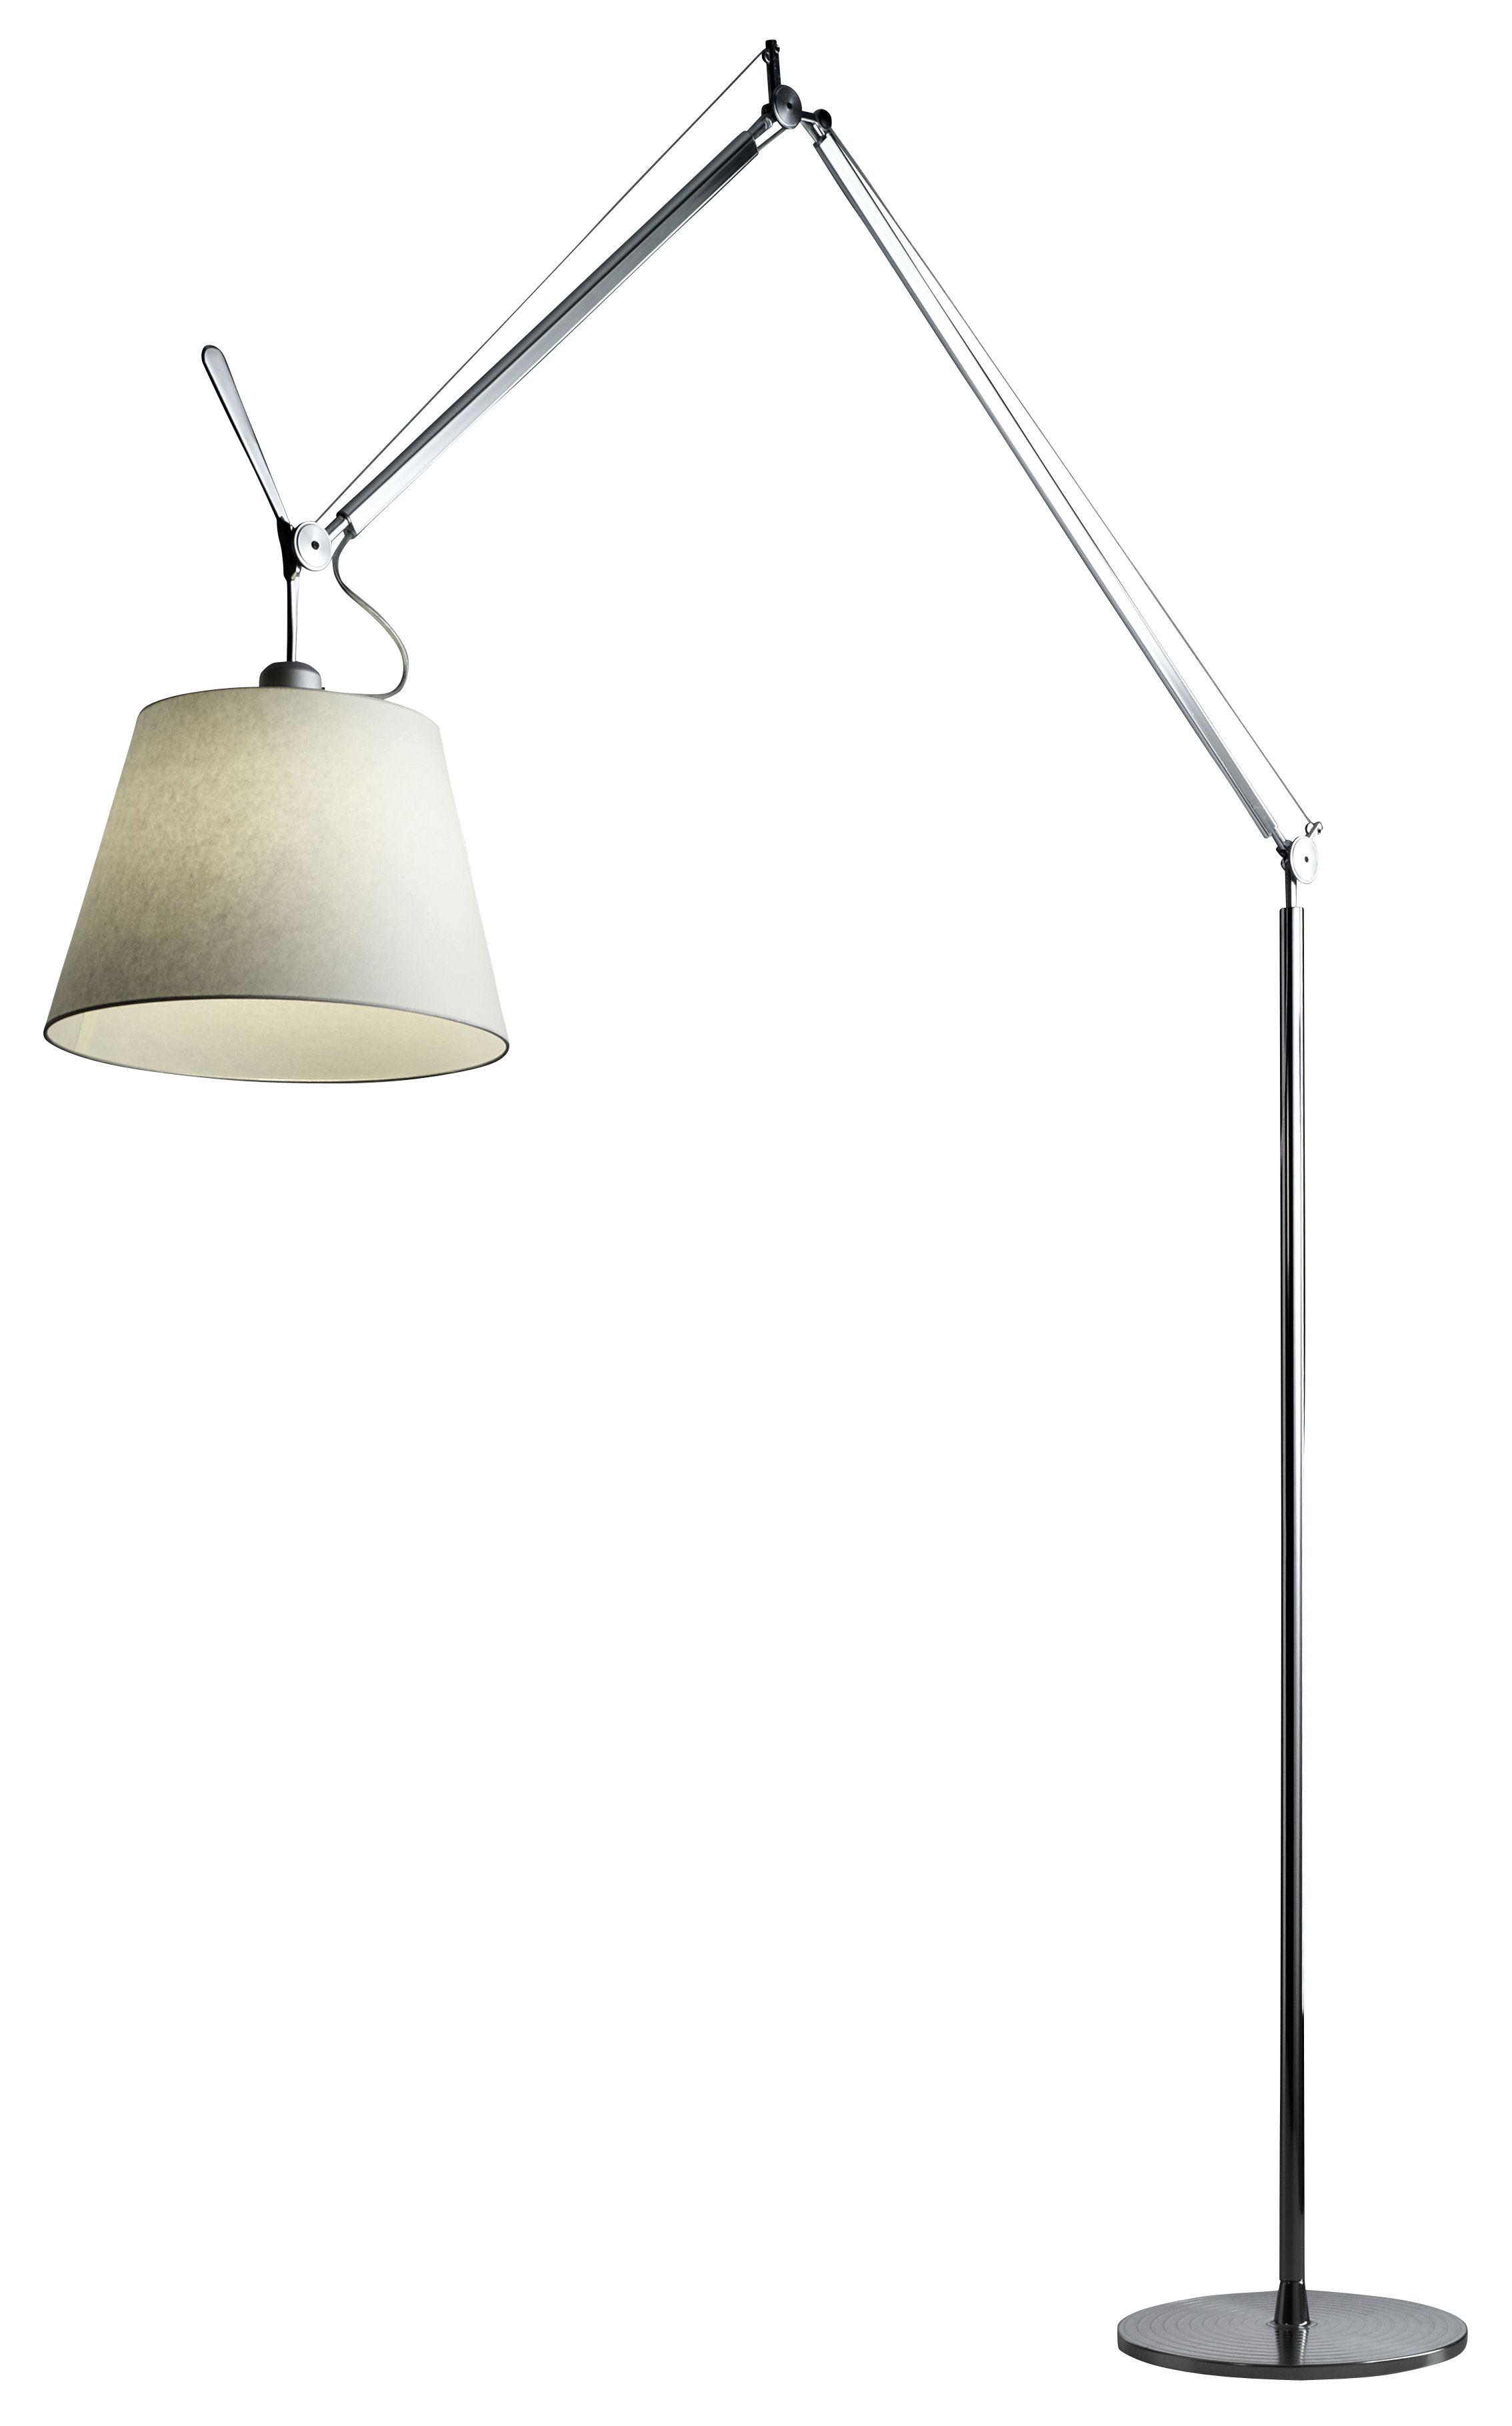 Lighting - Floor lamps - Tolomeo Mega Floor lamp - H 148 to 327 cm by Artemide - Diffuser Ø 42 cm / Beige - Aluminium, Parchment paper